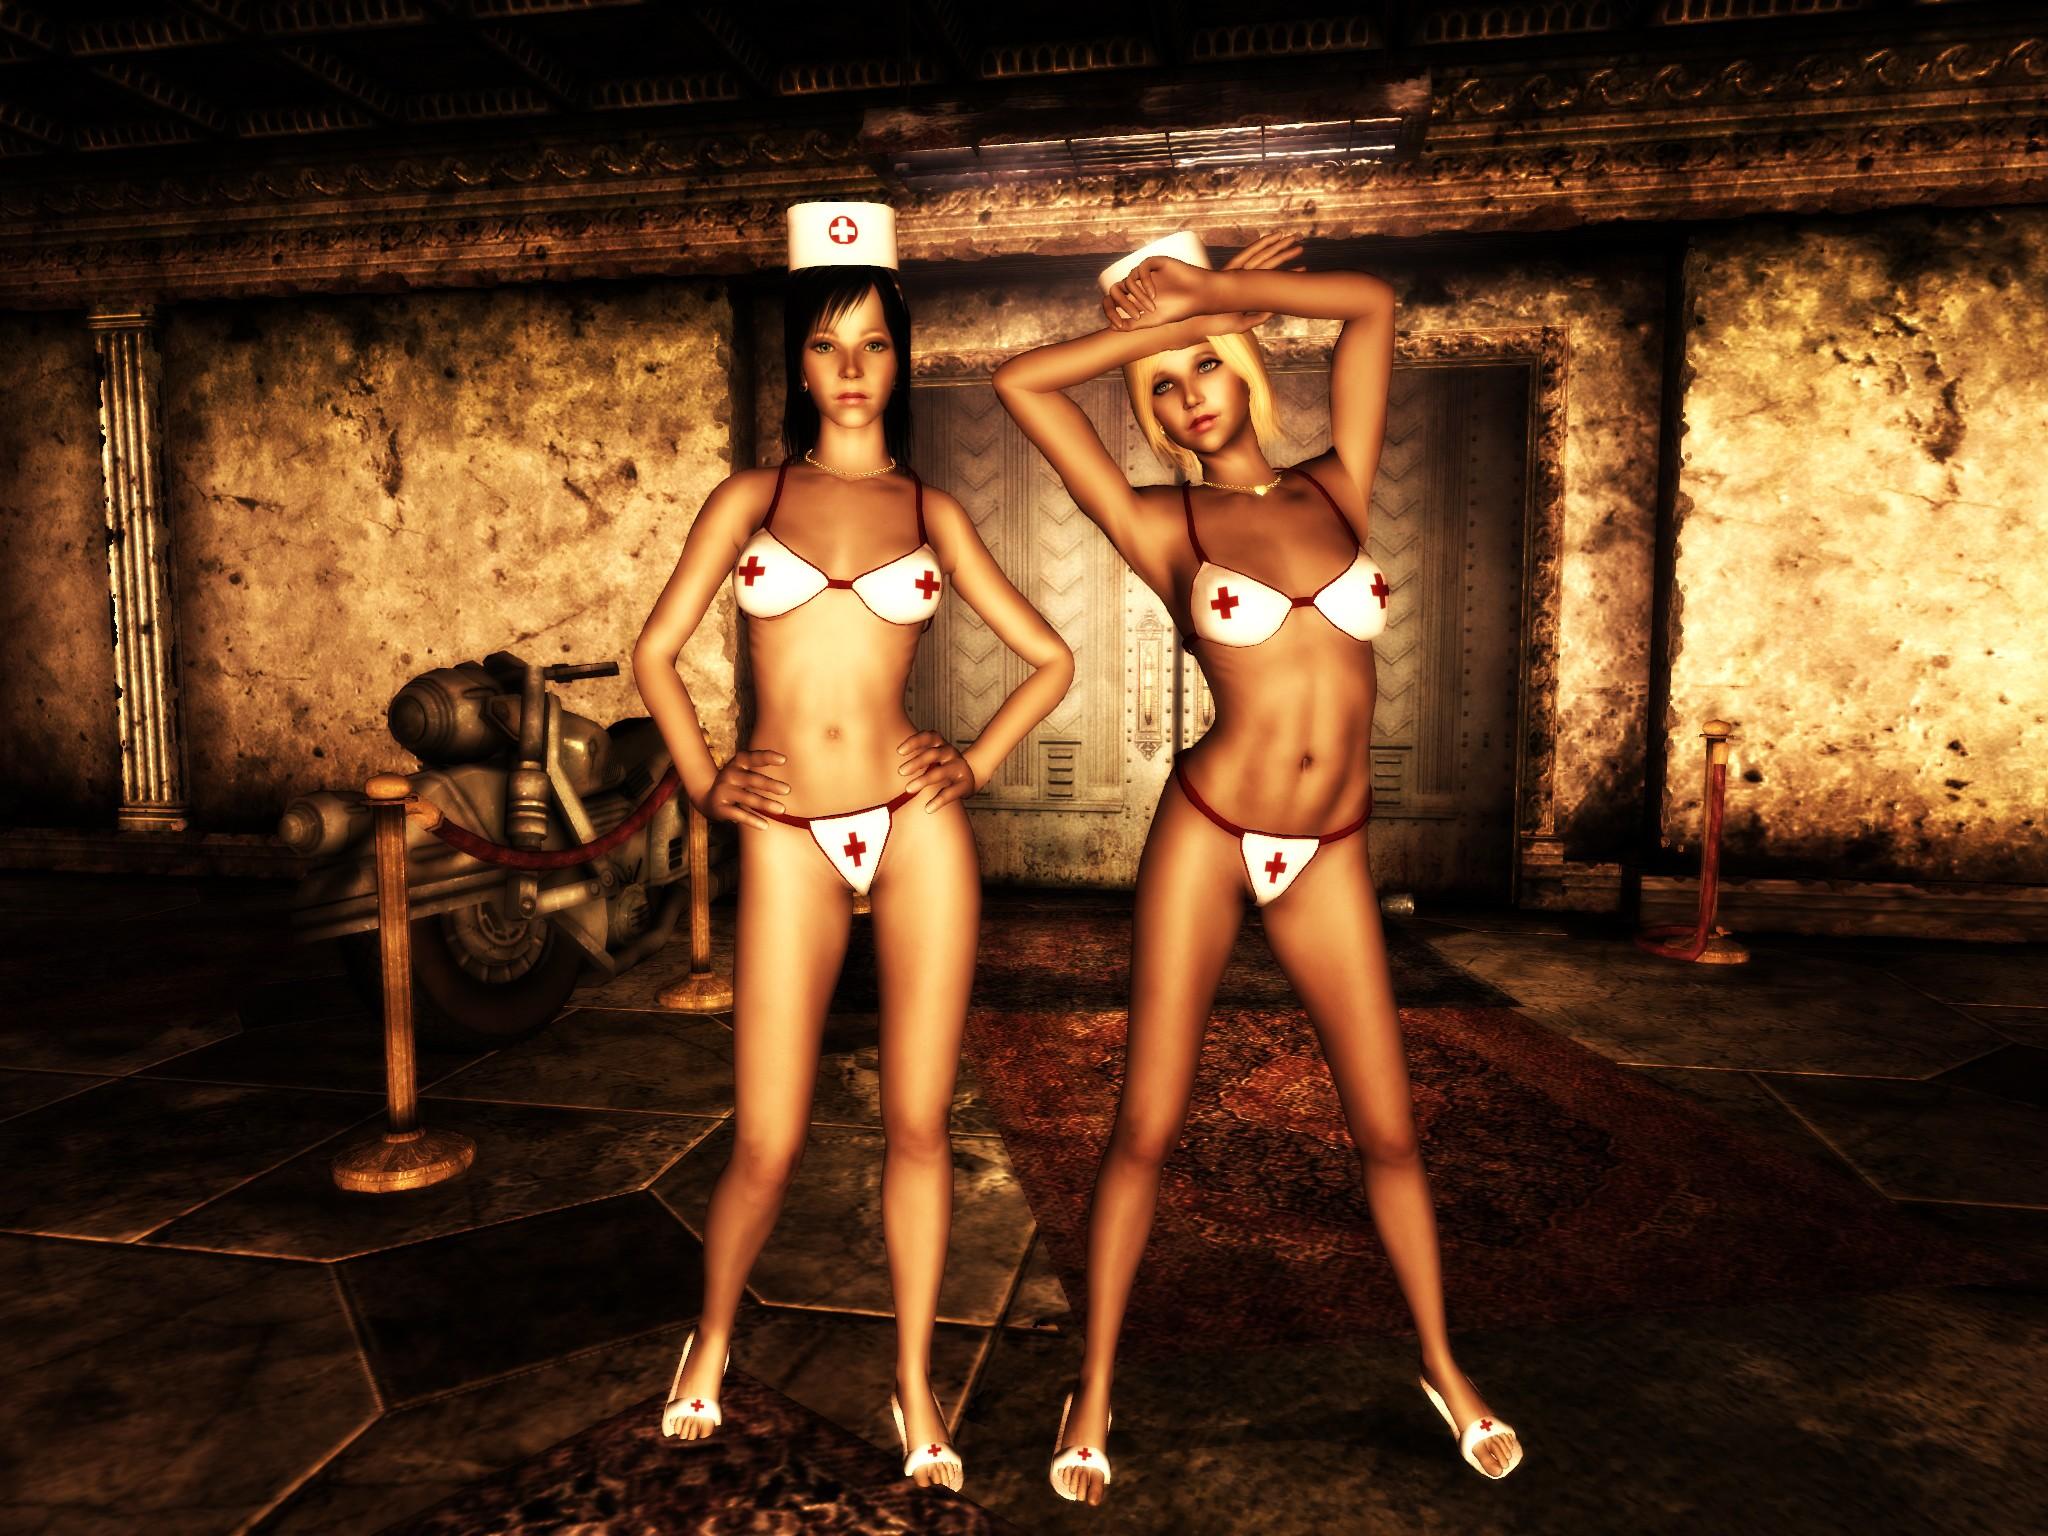 Fallout3 pornpics pornos gallery